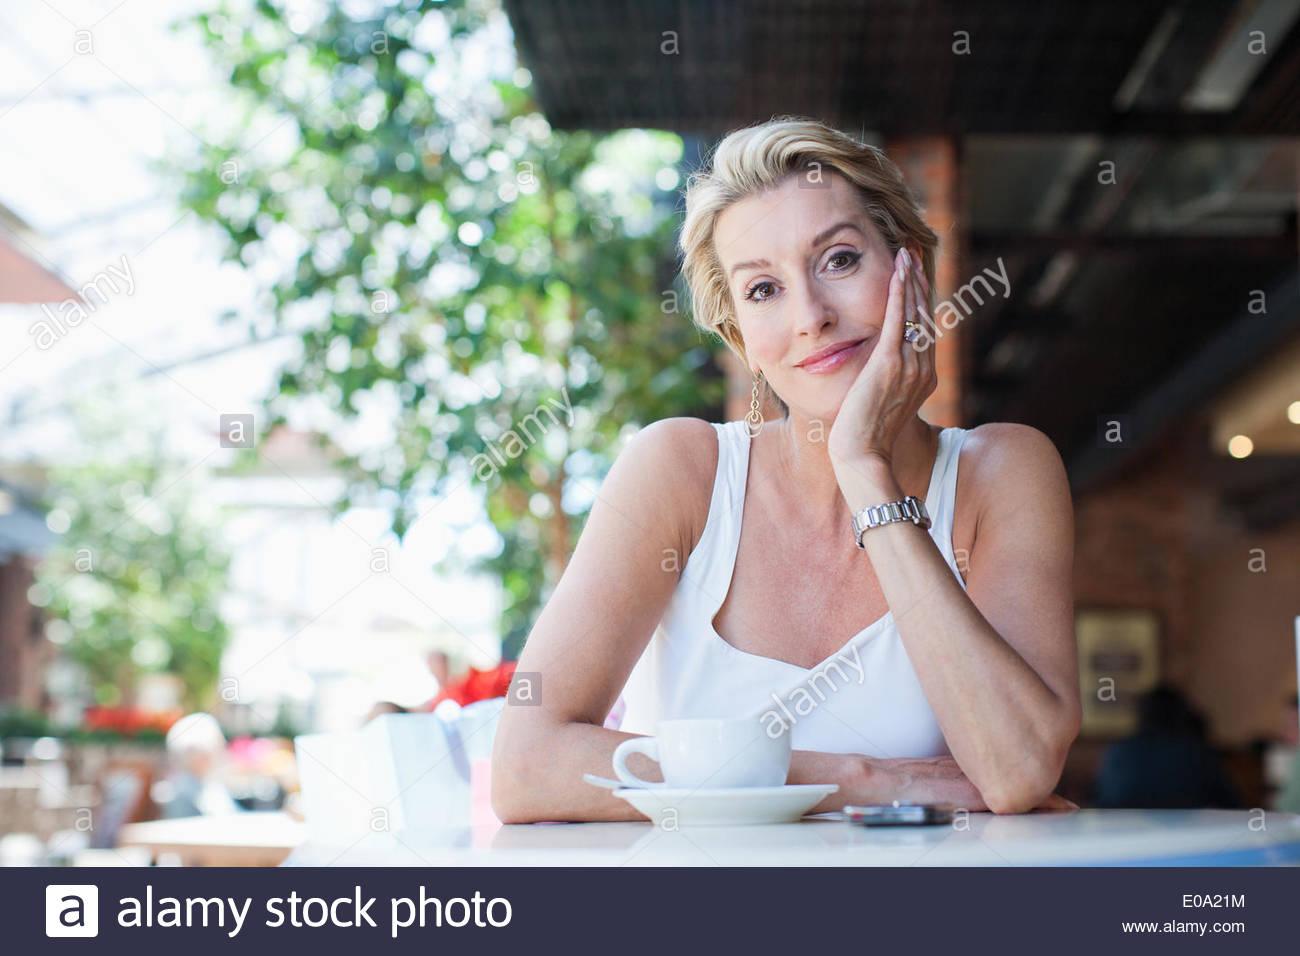 Frau trinkt Kaffee im café Stockbild